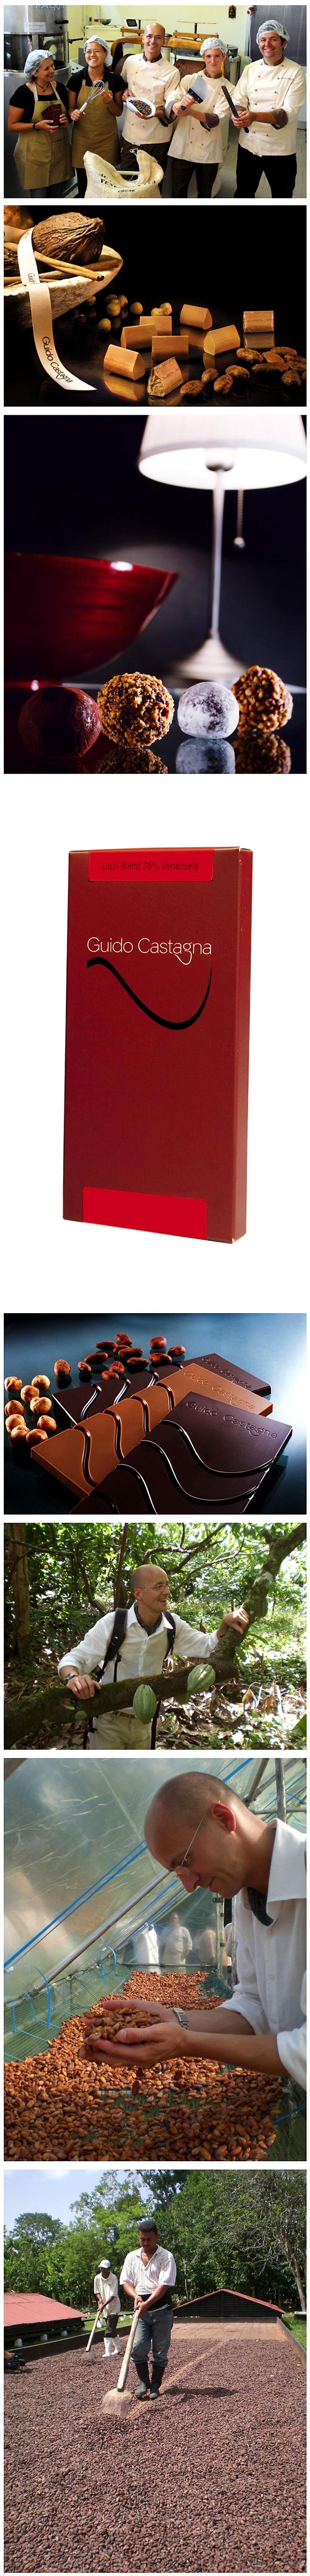 Guido Castagna's Exquisite Chocolate  Vi aspetta a #Giaveno #aboutvalsangone